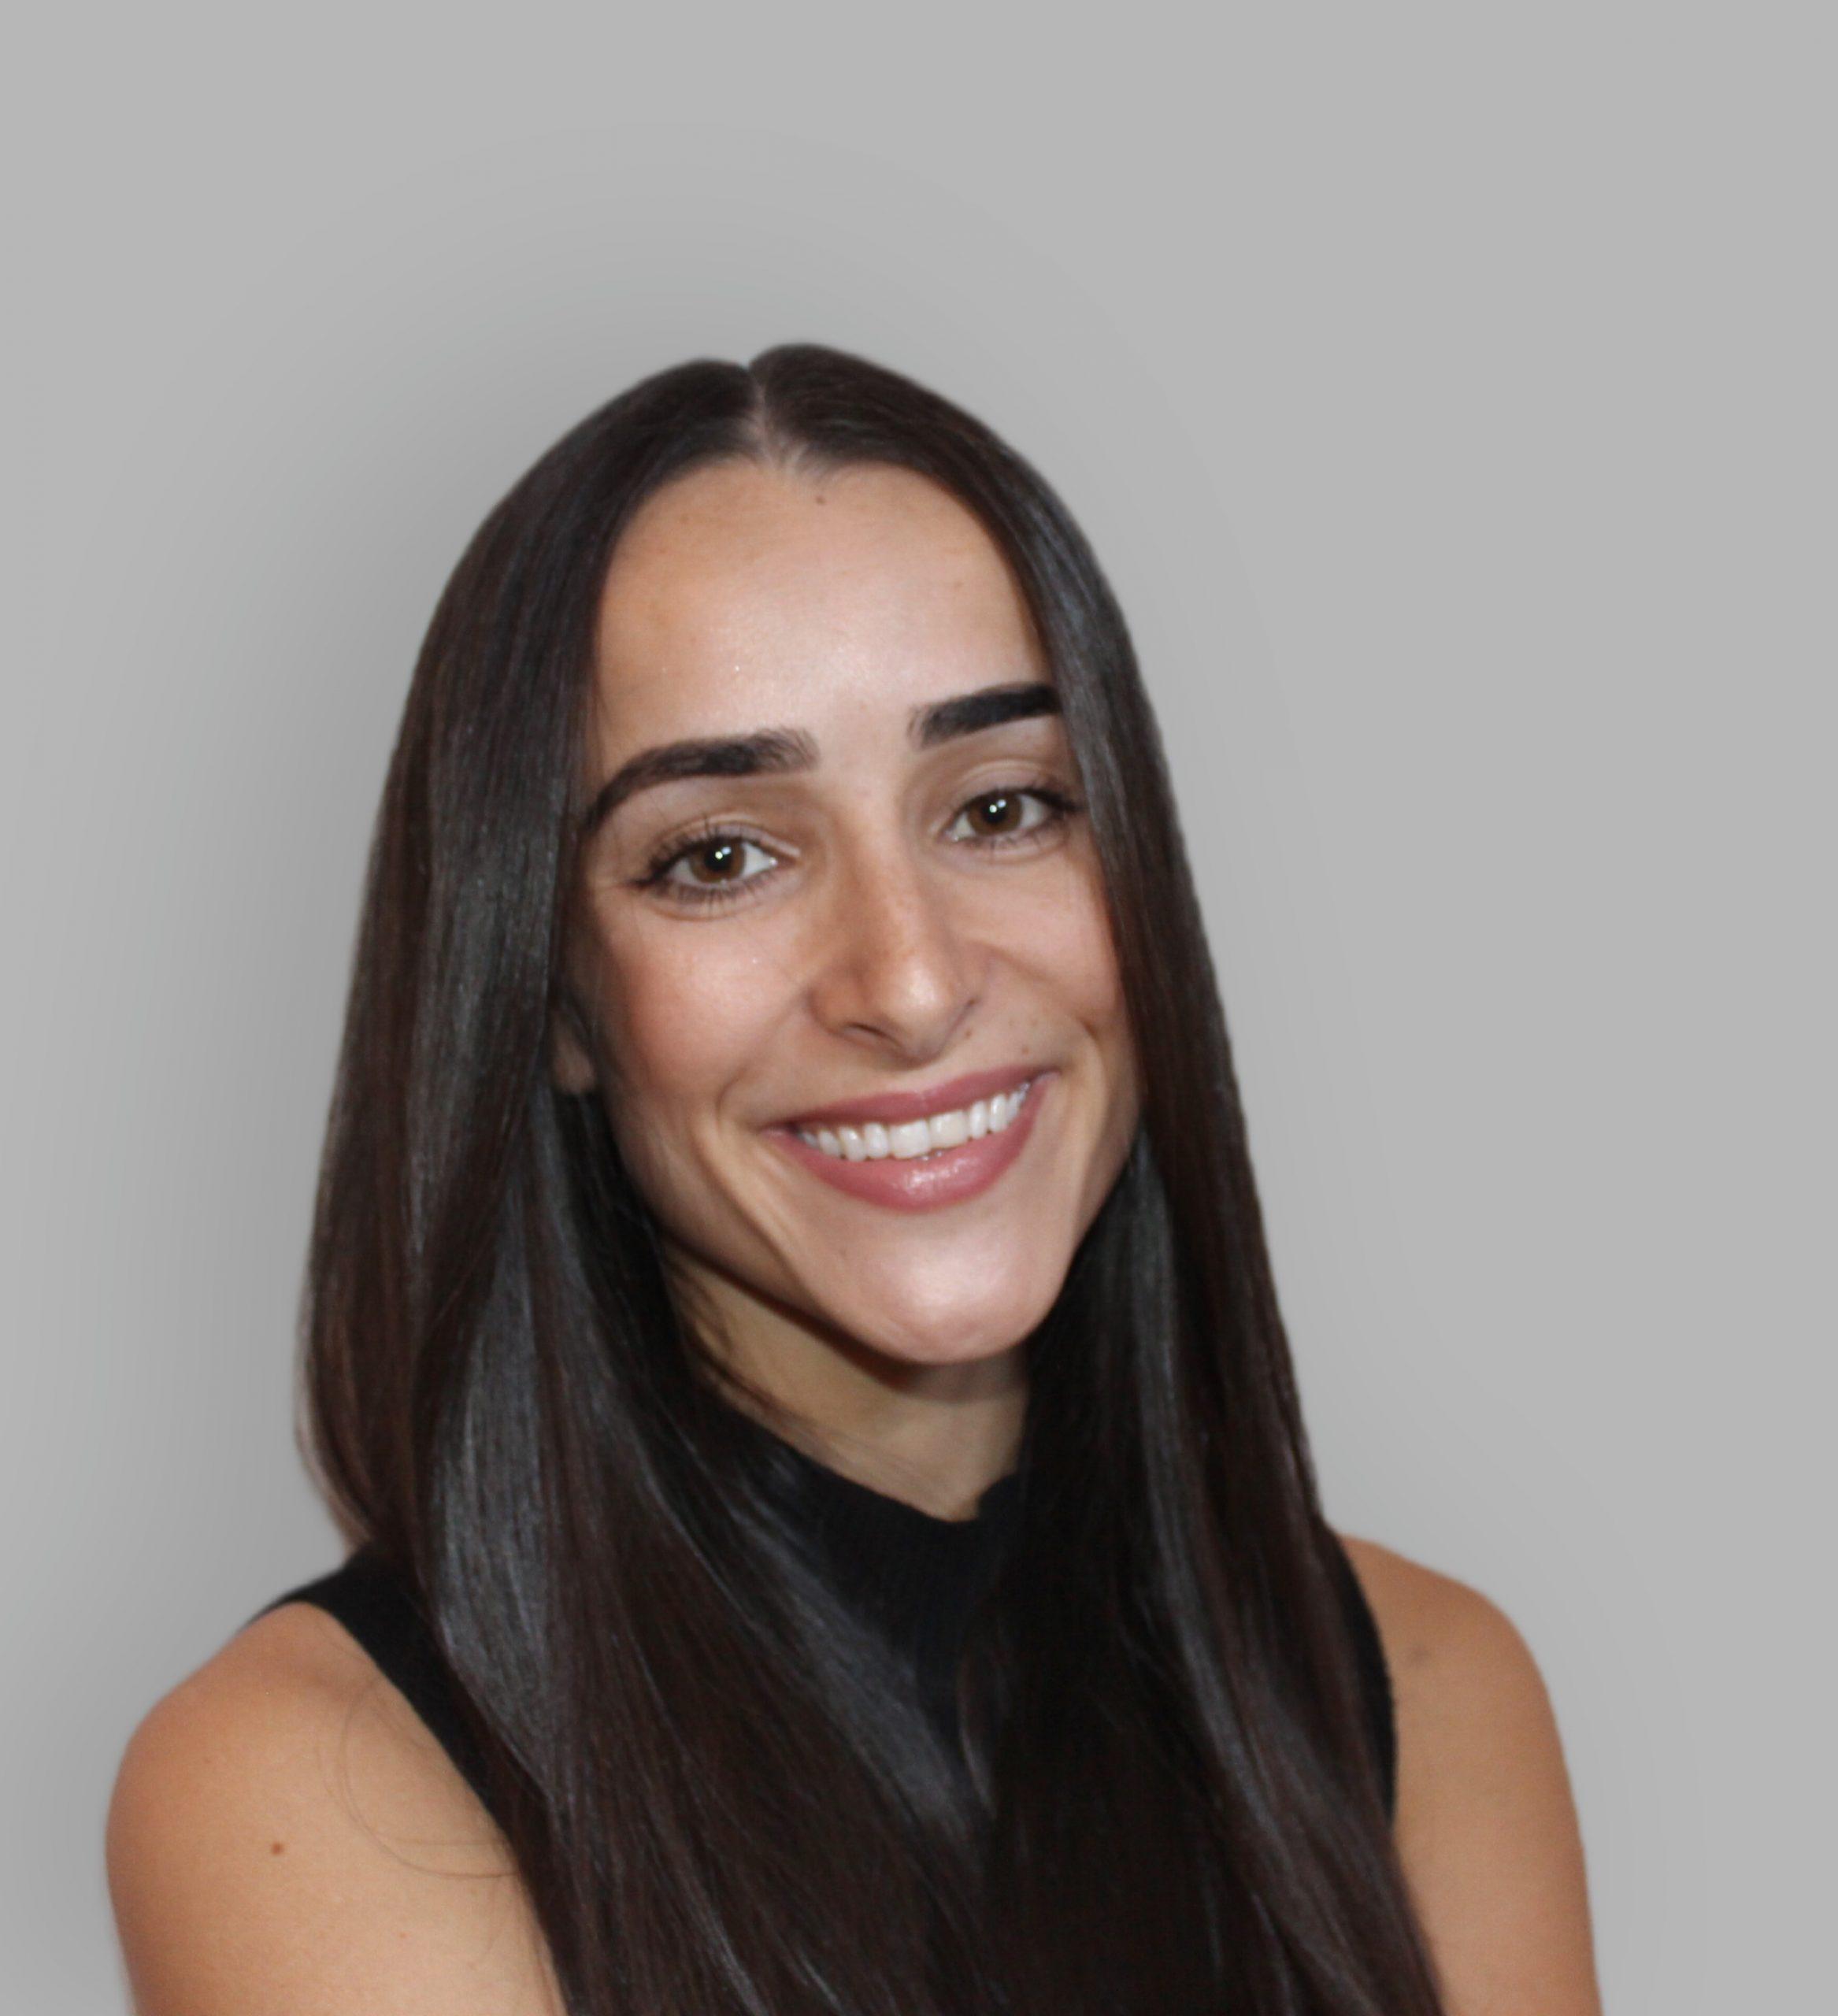 Alana Fasolo, Perth, WA, ORS